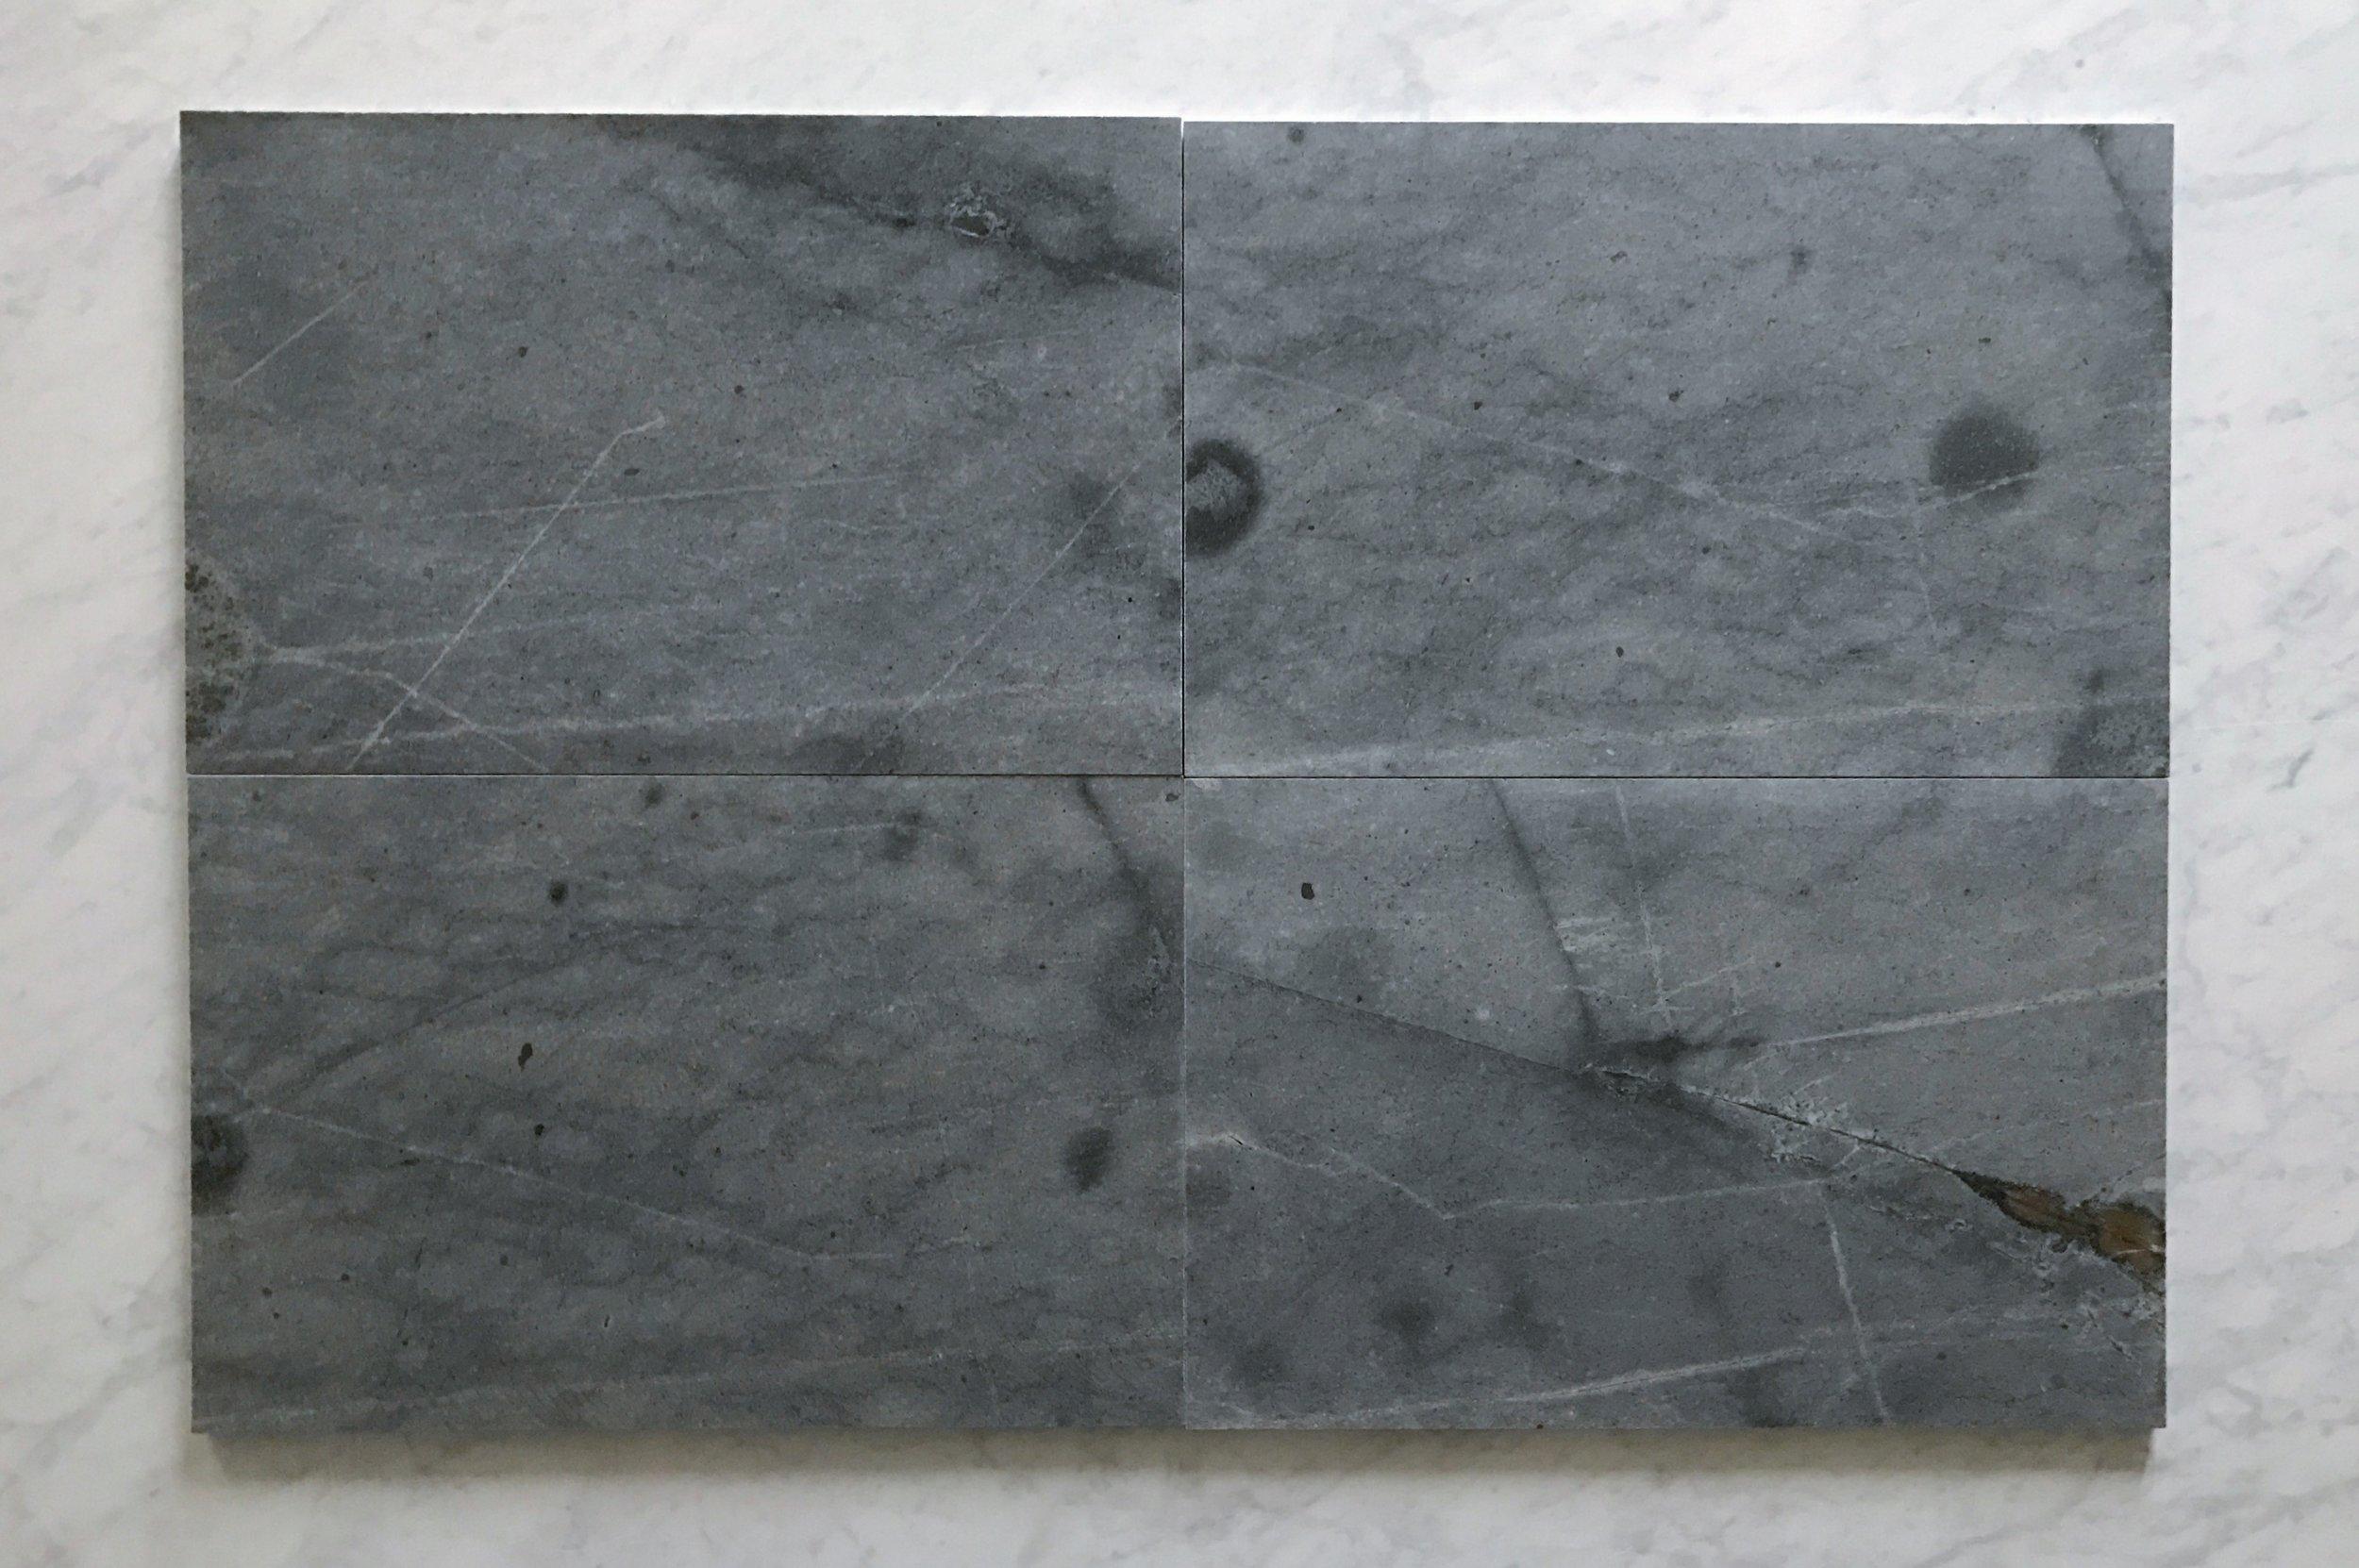 Blue Porphyry Granite 16x24 Polished